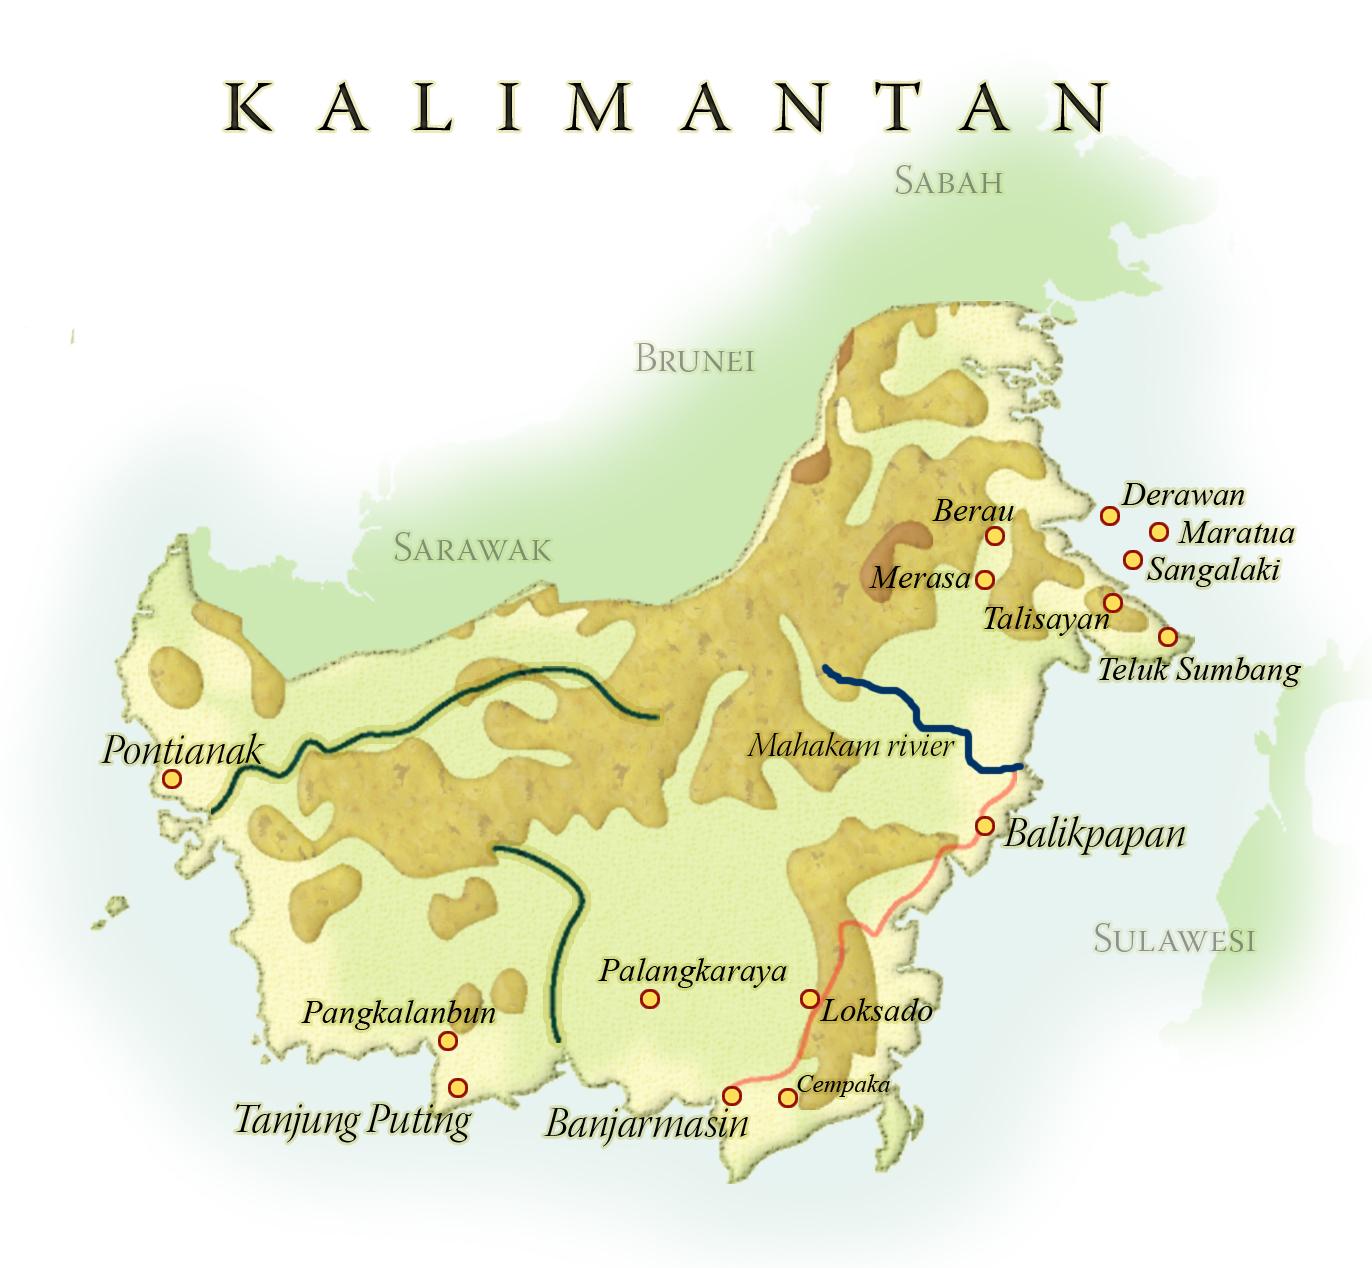 Landkaart Kalimantan, 7 april 2019